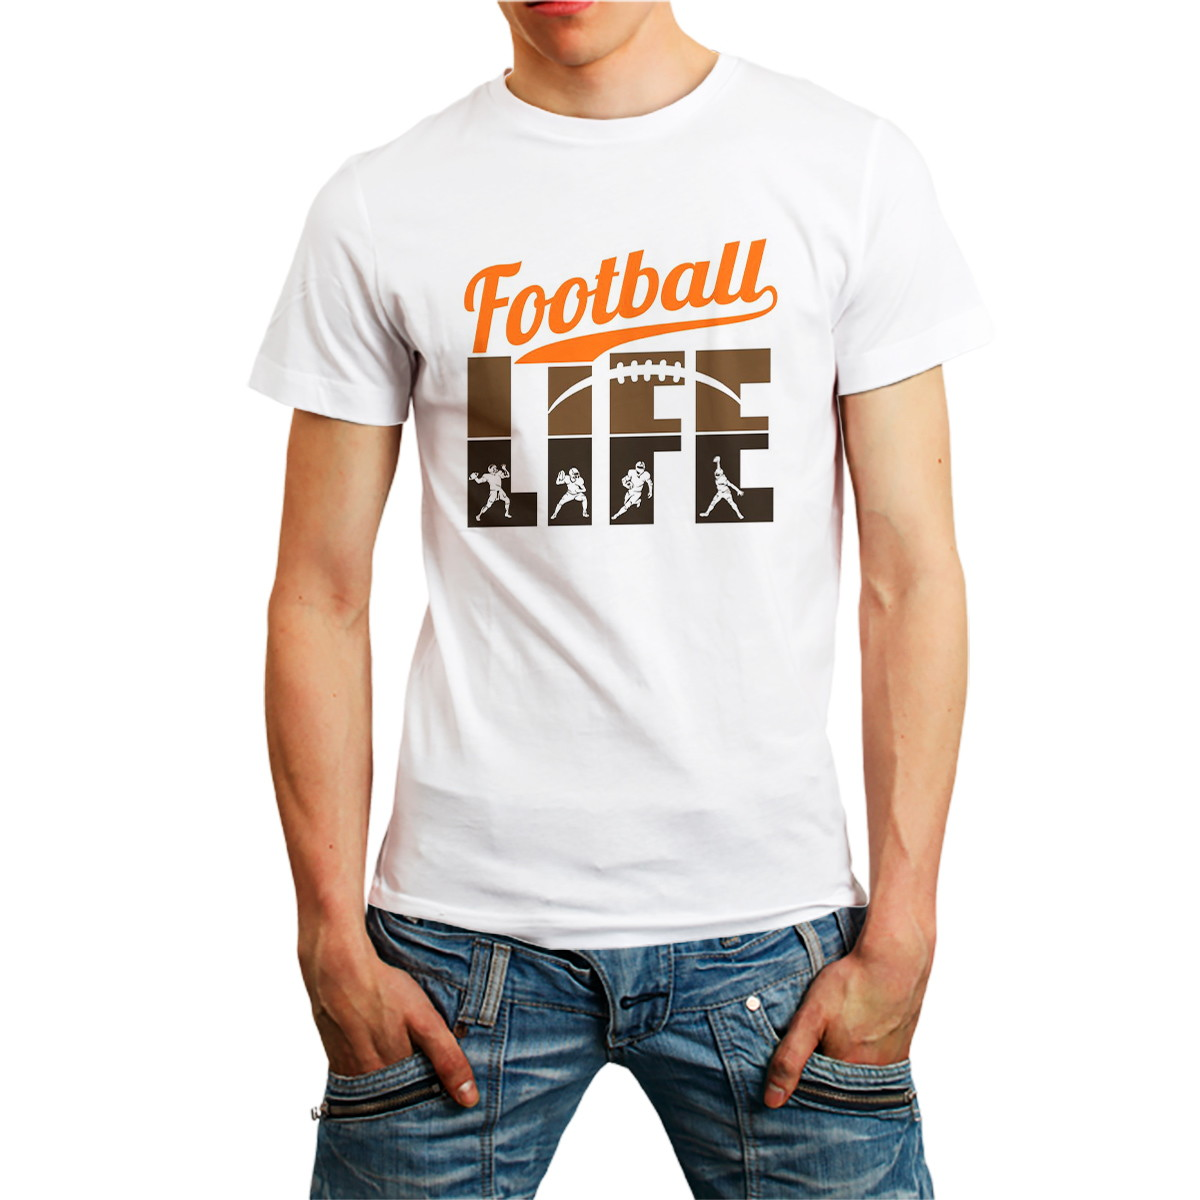 674b0d0d88 Camiseta Futebol Americano Football Camisa Homem Roupa no Elo7 ...